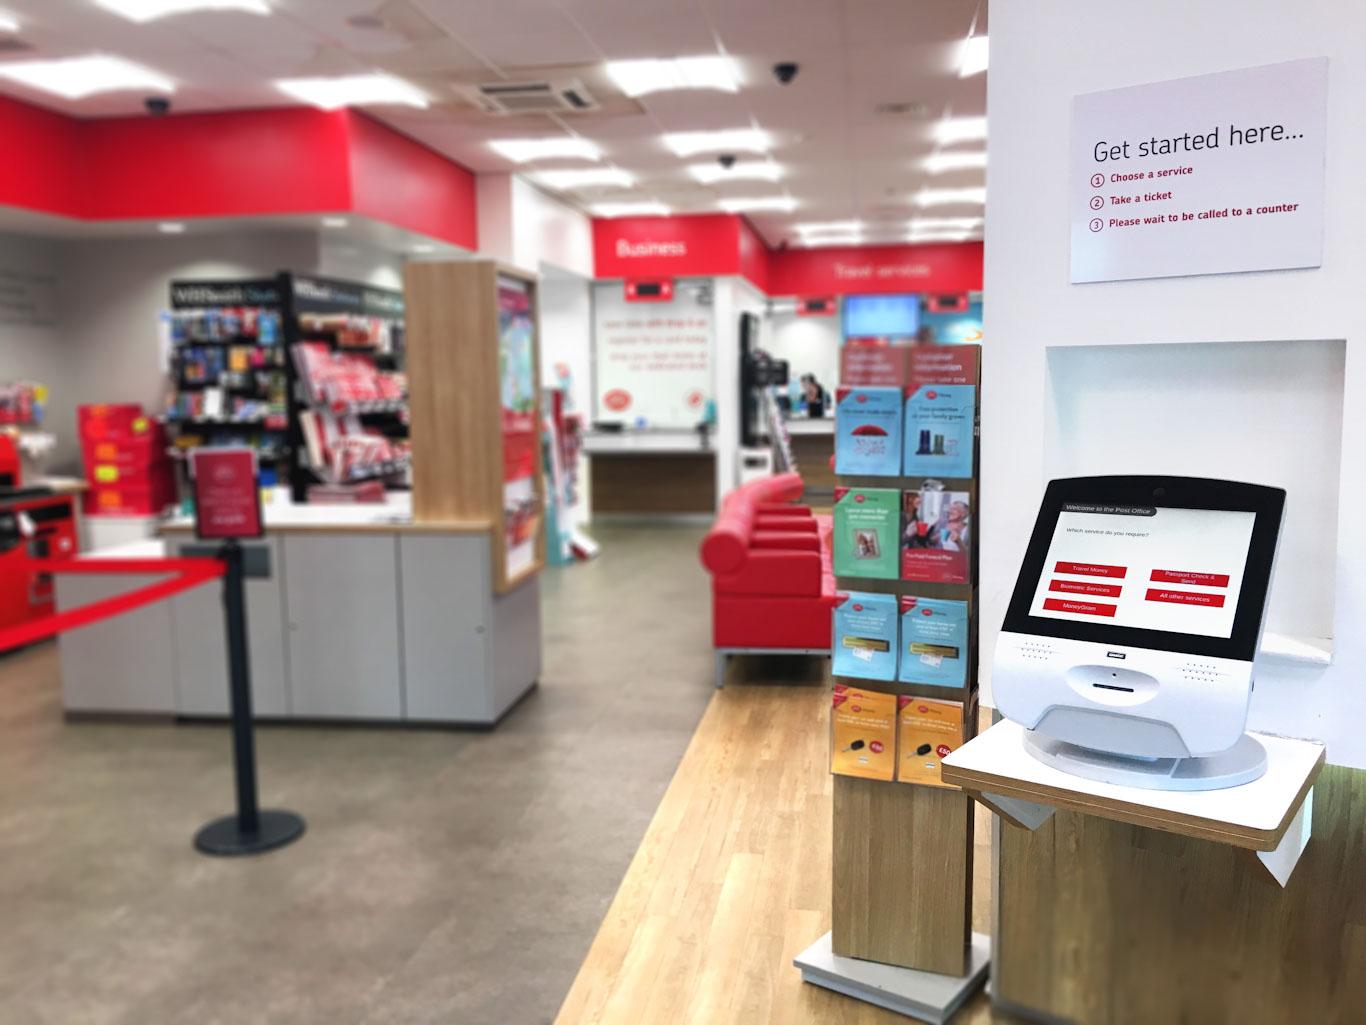 UK Qmatic Post Office Image 2.jpg